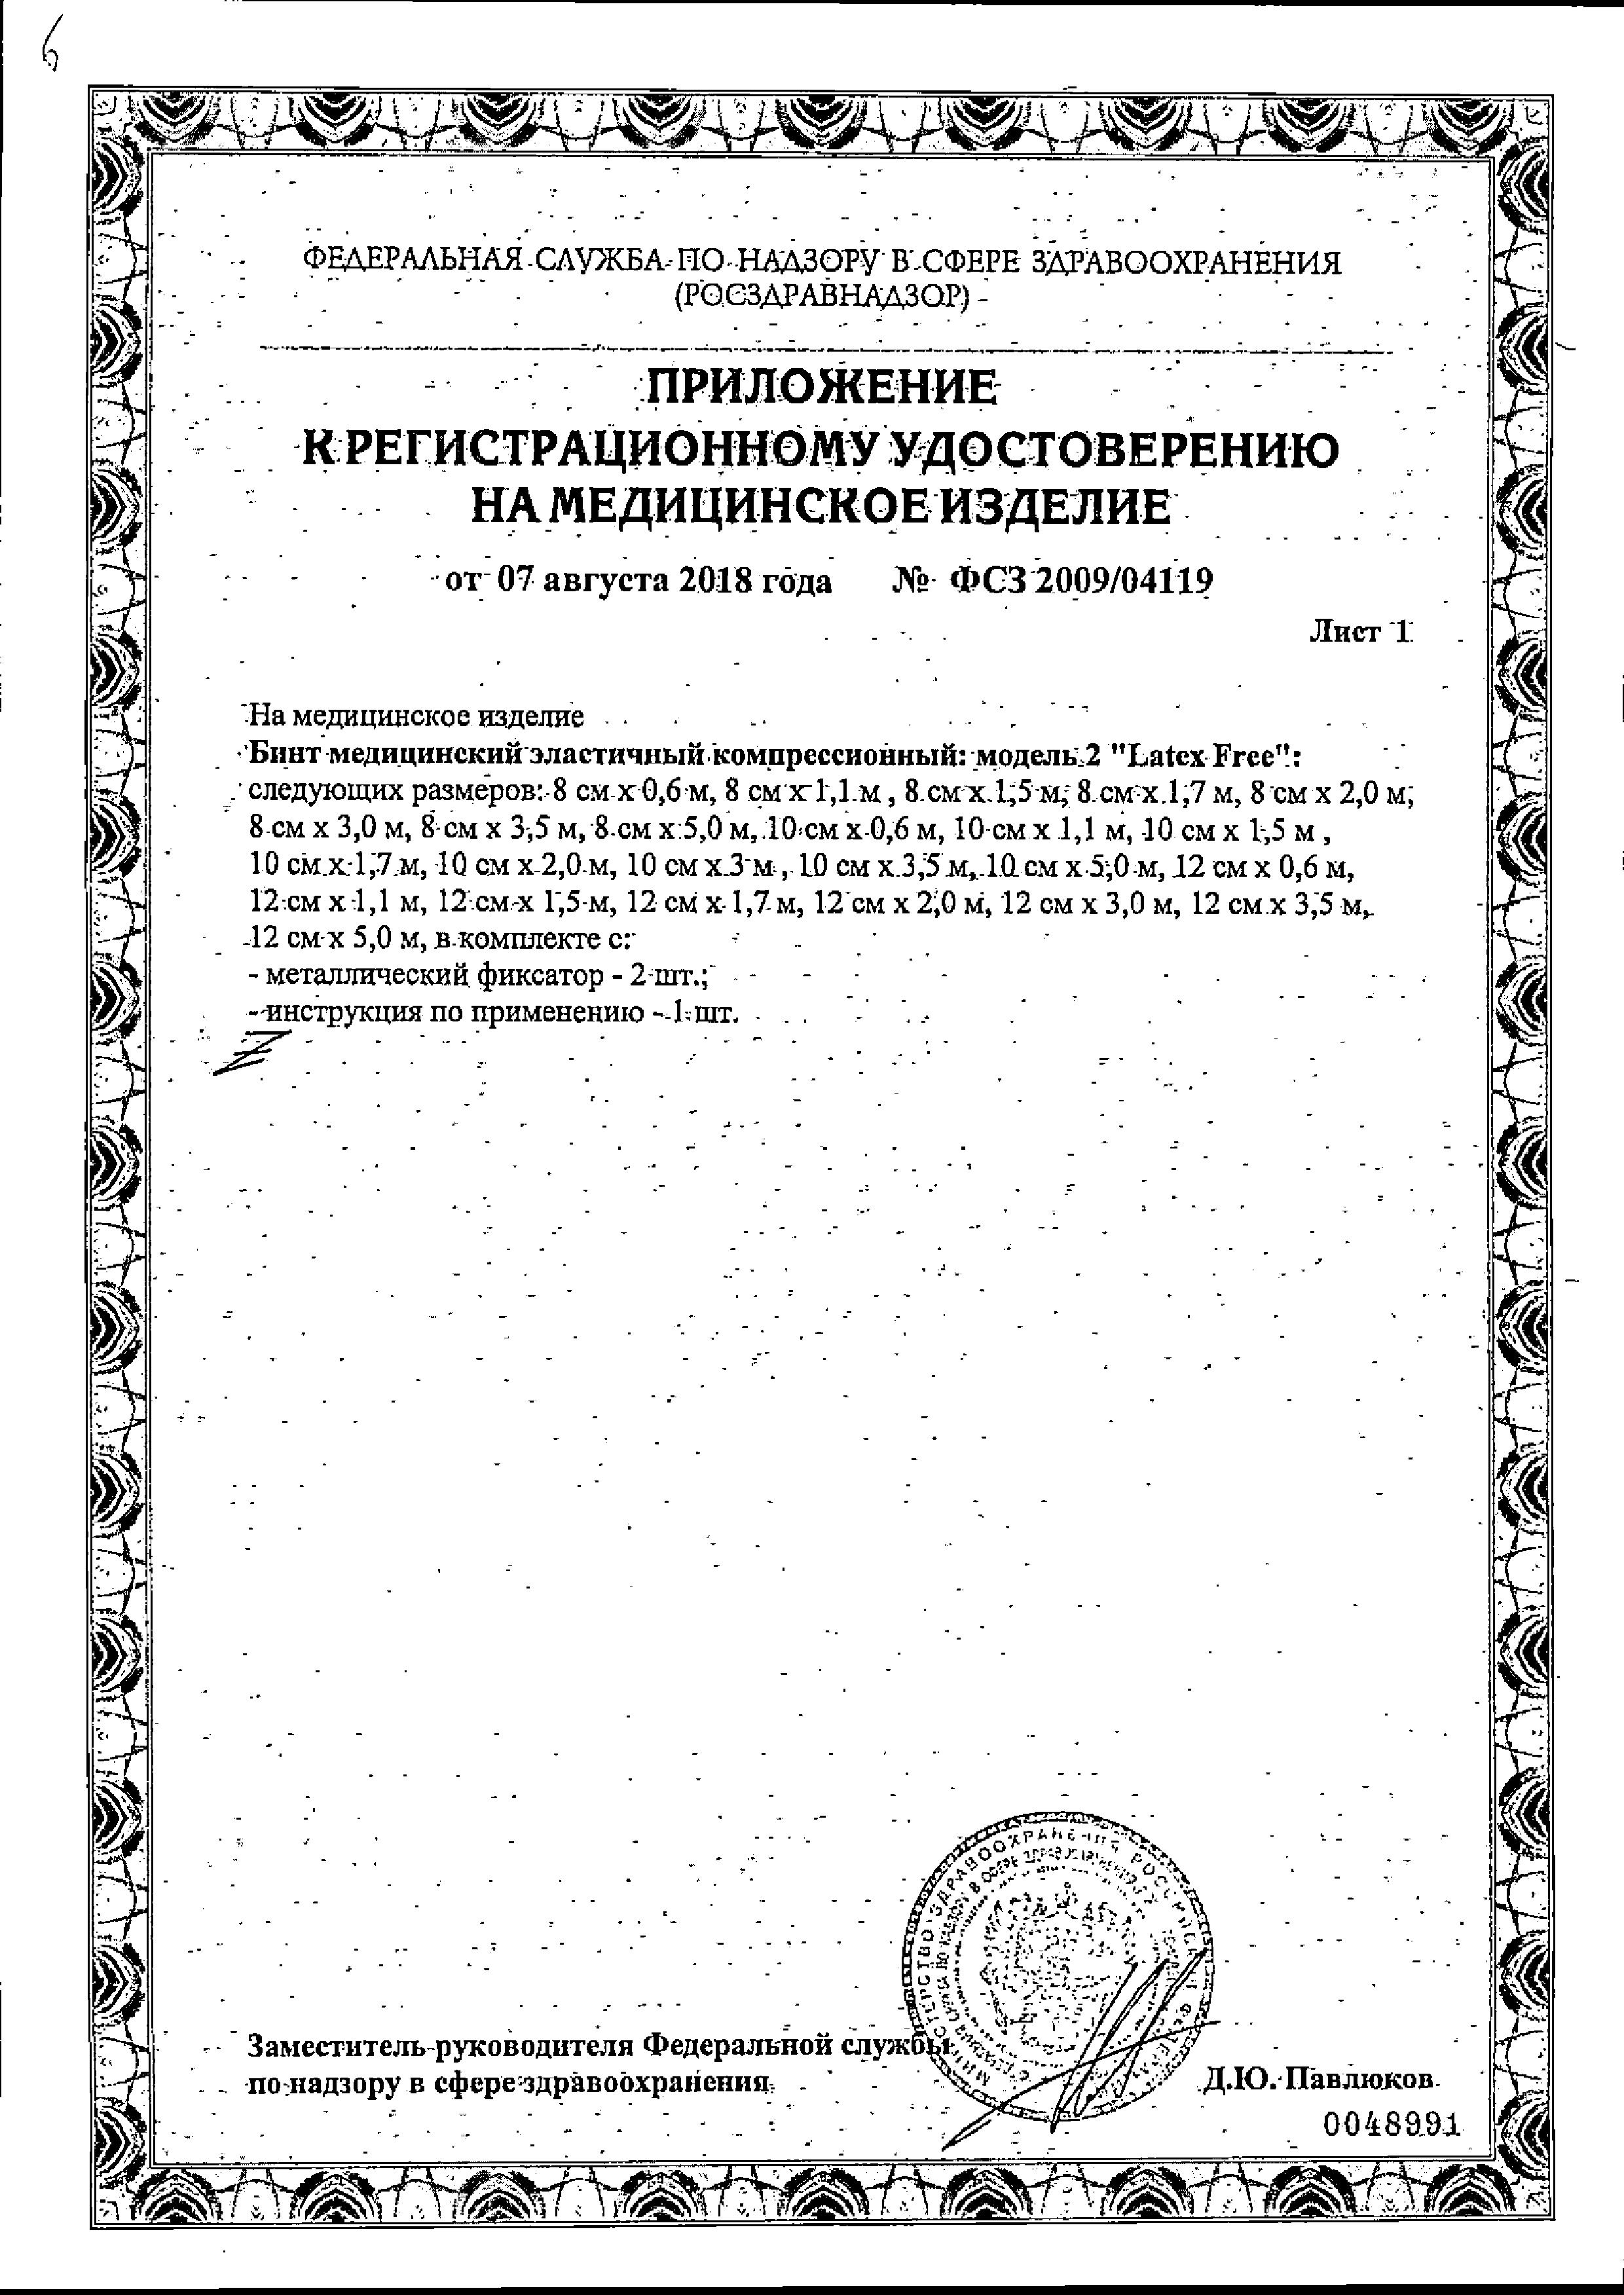 Бинты эластичные медицинские сертификат